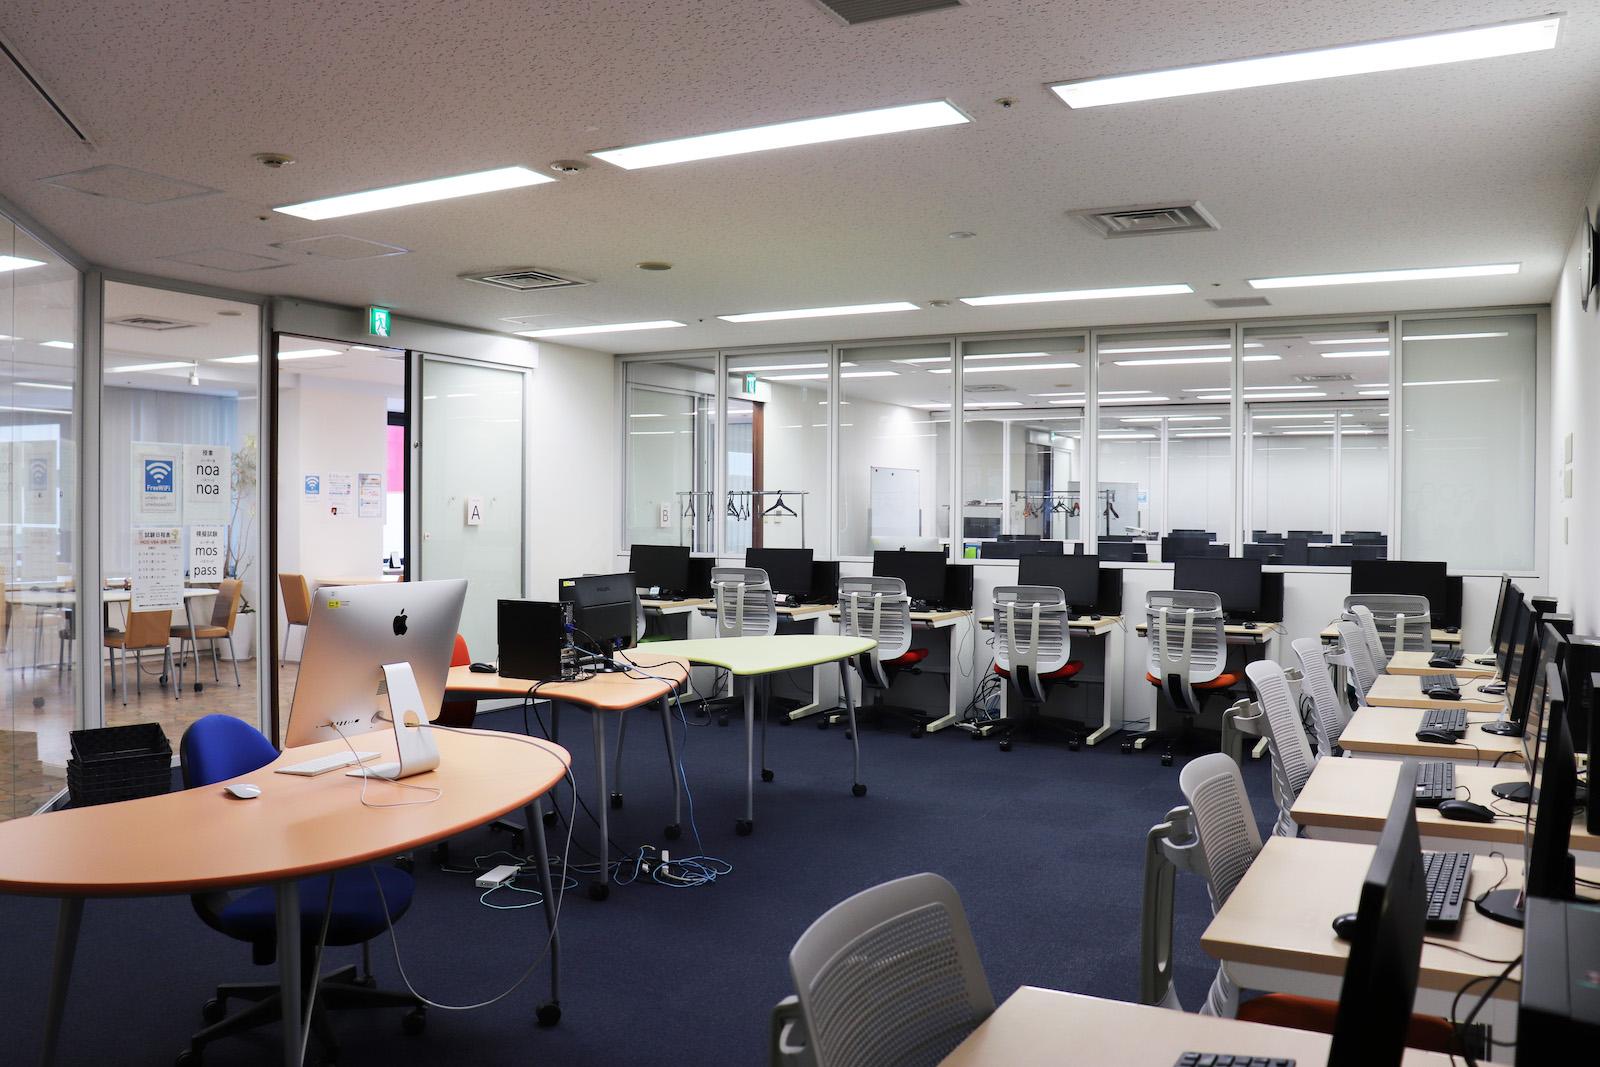 noa梅田校 教室・自習室1